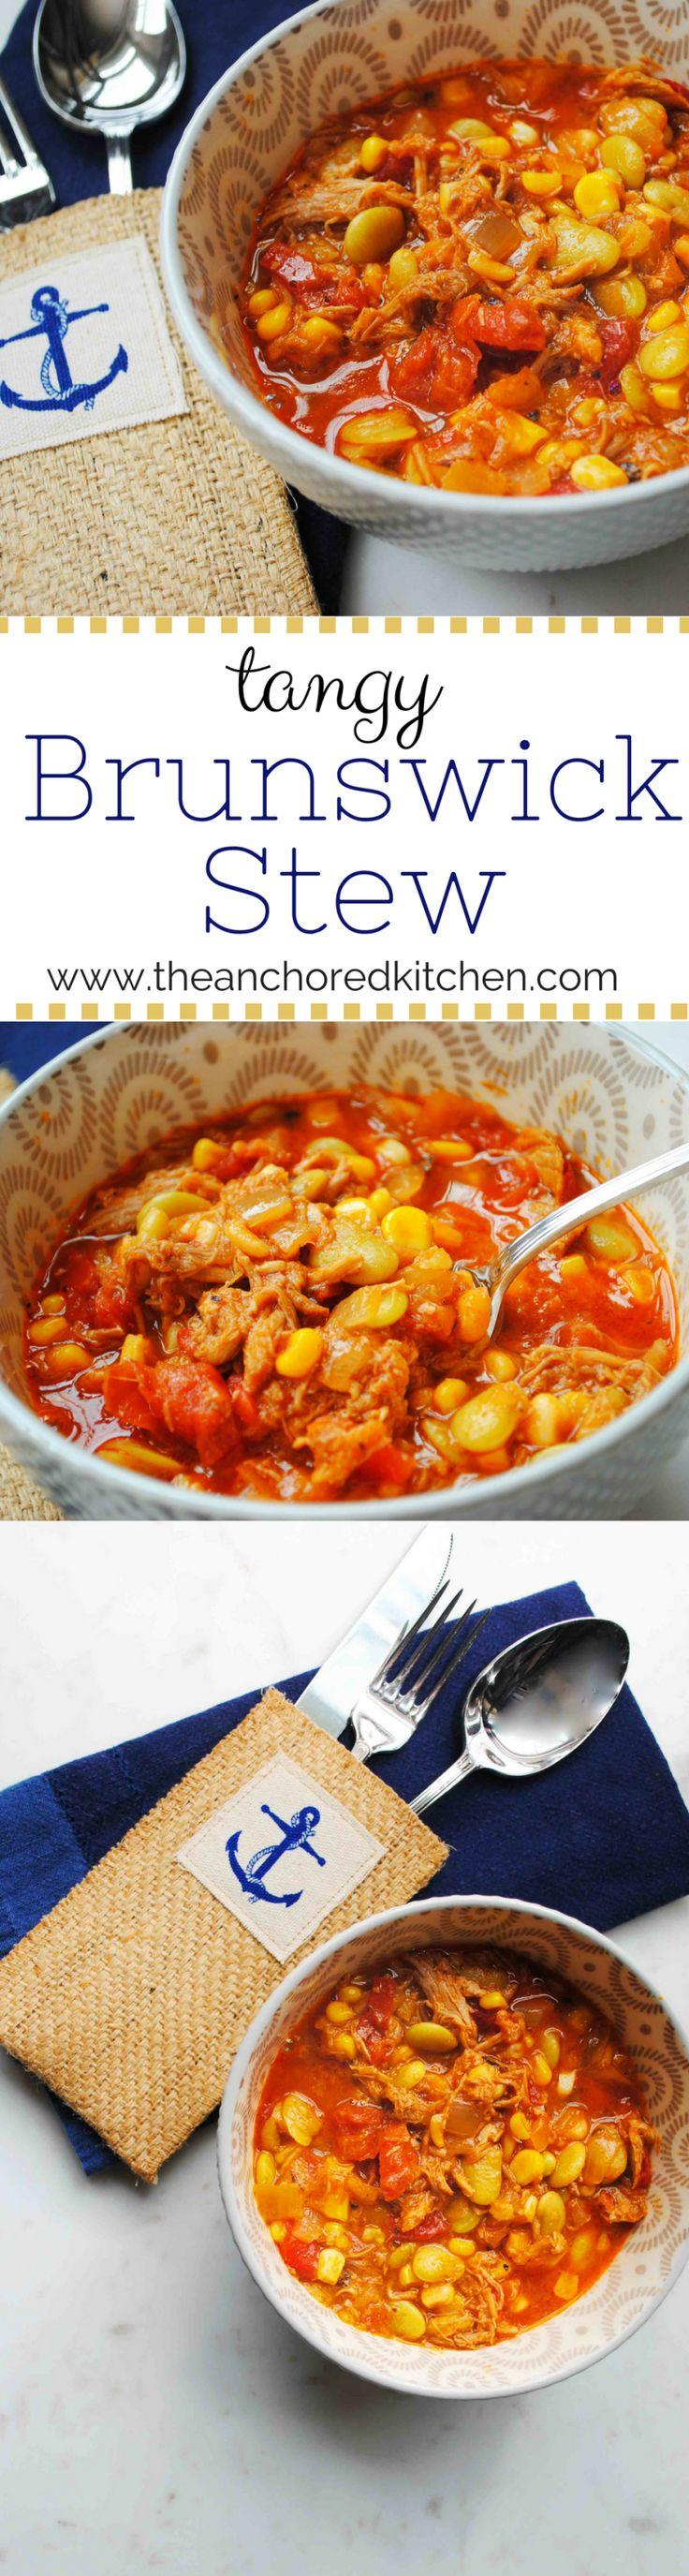 Tangy Brunswick Stew - The Anchored Kitchen #brunswickstew #coastalgeorgiarecipes #pulledporkrecipe #southernfood #onepotmeal